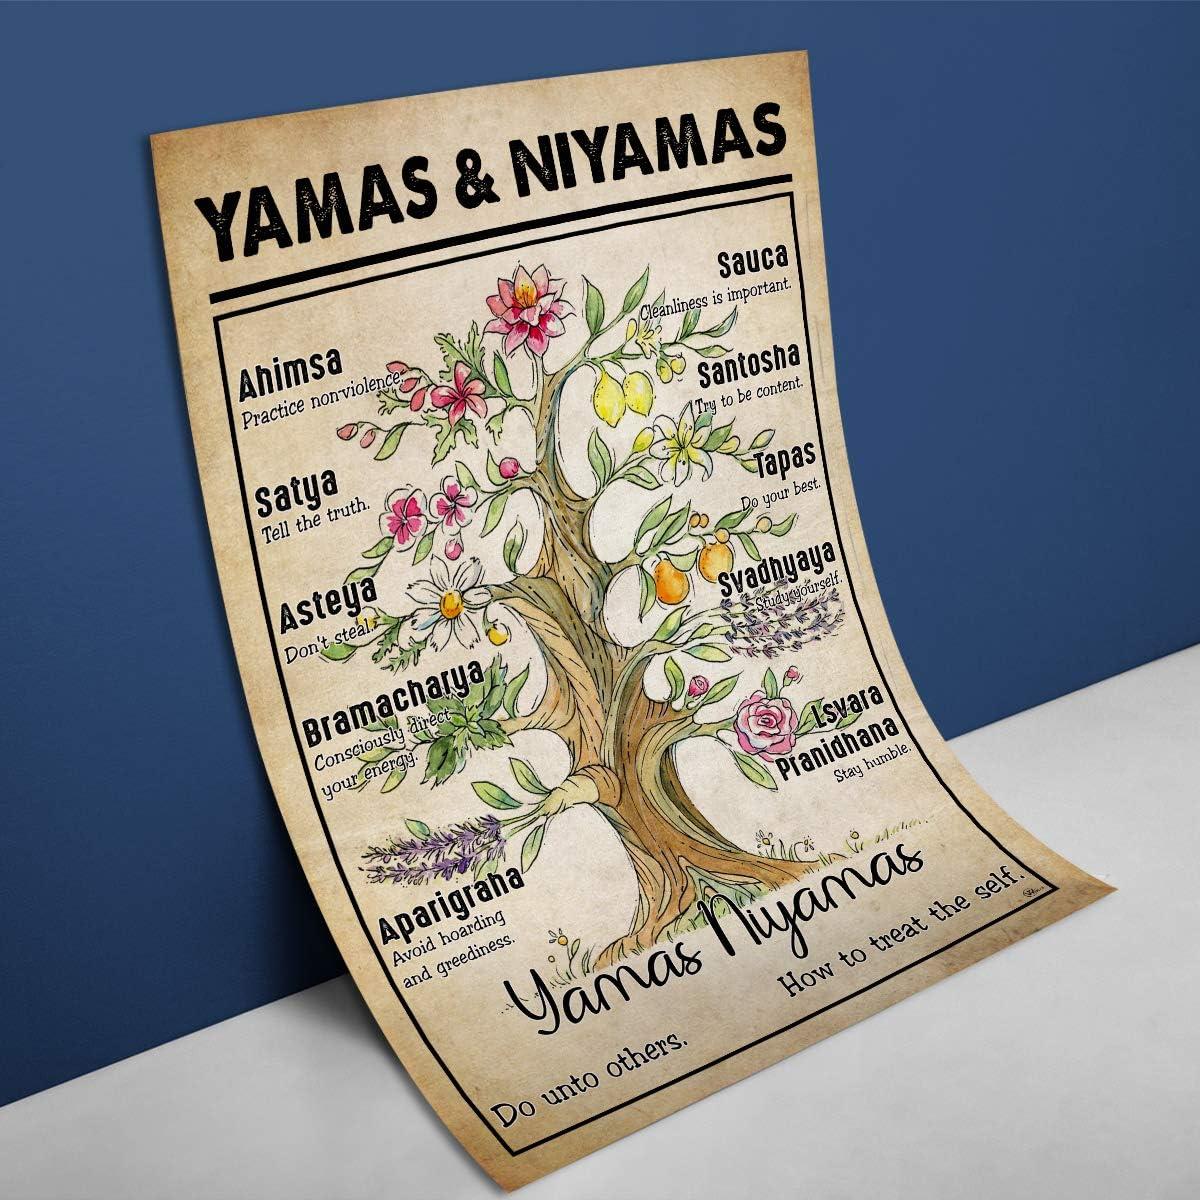 Yamas /& Niyamas Poster Yoga Wall Decor Meditation Poster Mindfulness Art Meditation Art Best Gift For Yoga Lover Tree of Life Poster